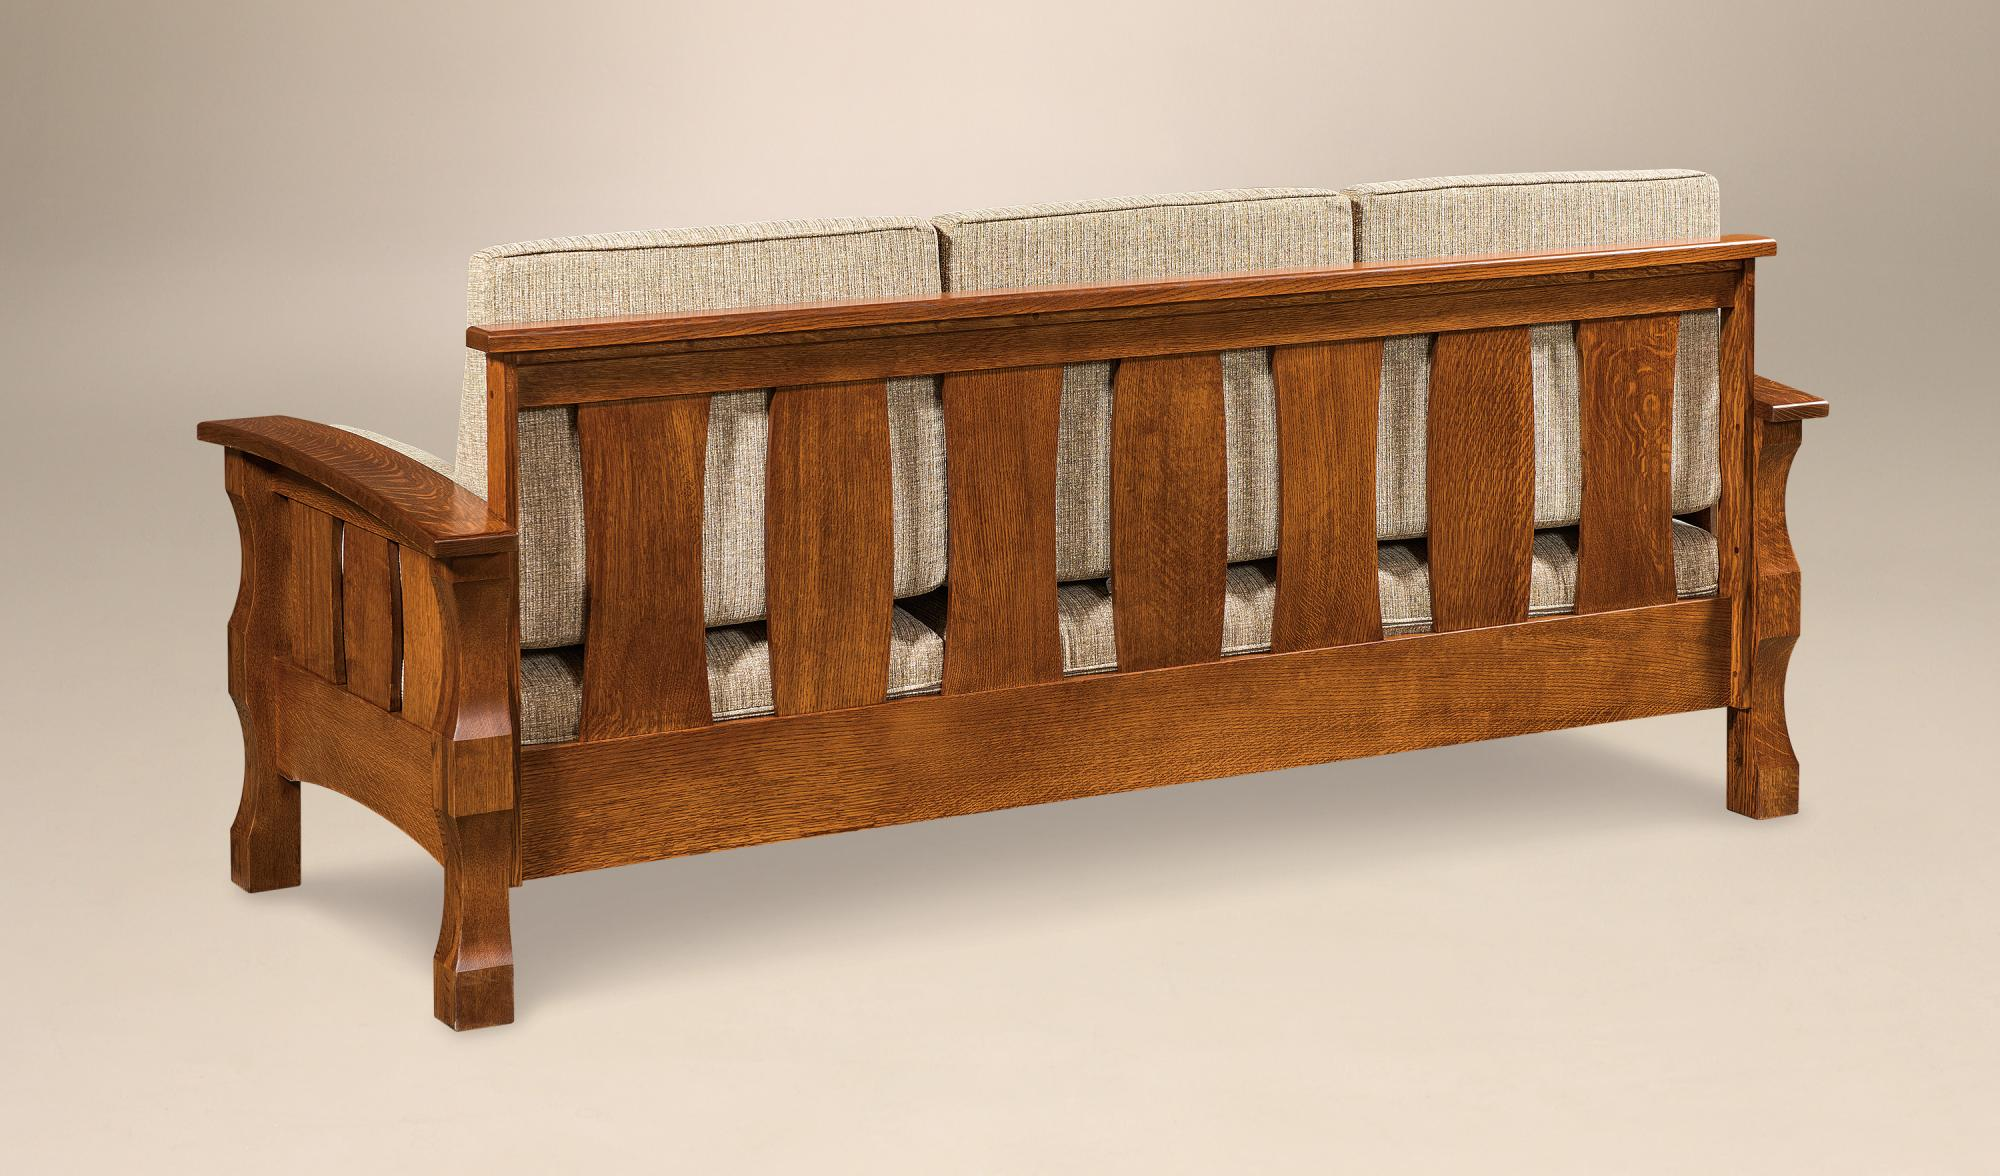 Balboa Amish Furniture Store Mankato Mn